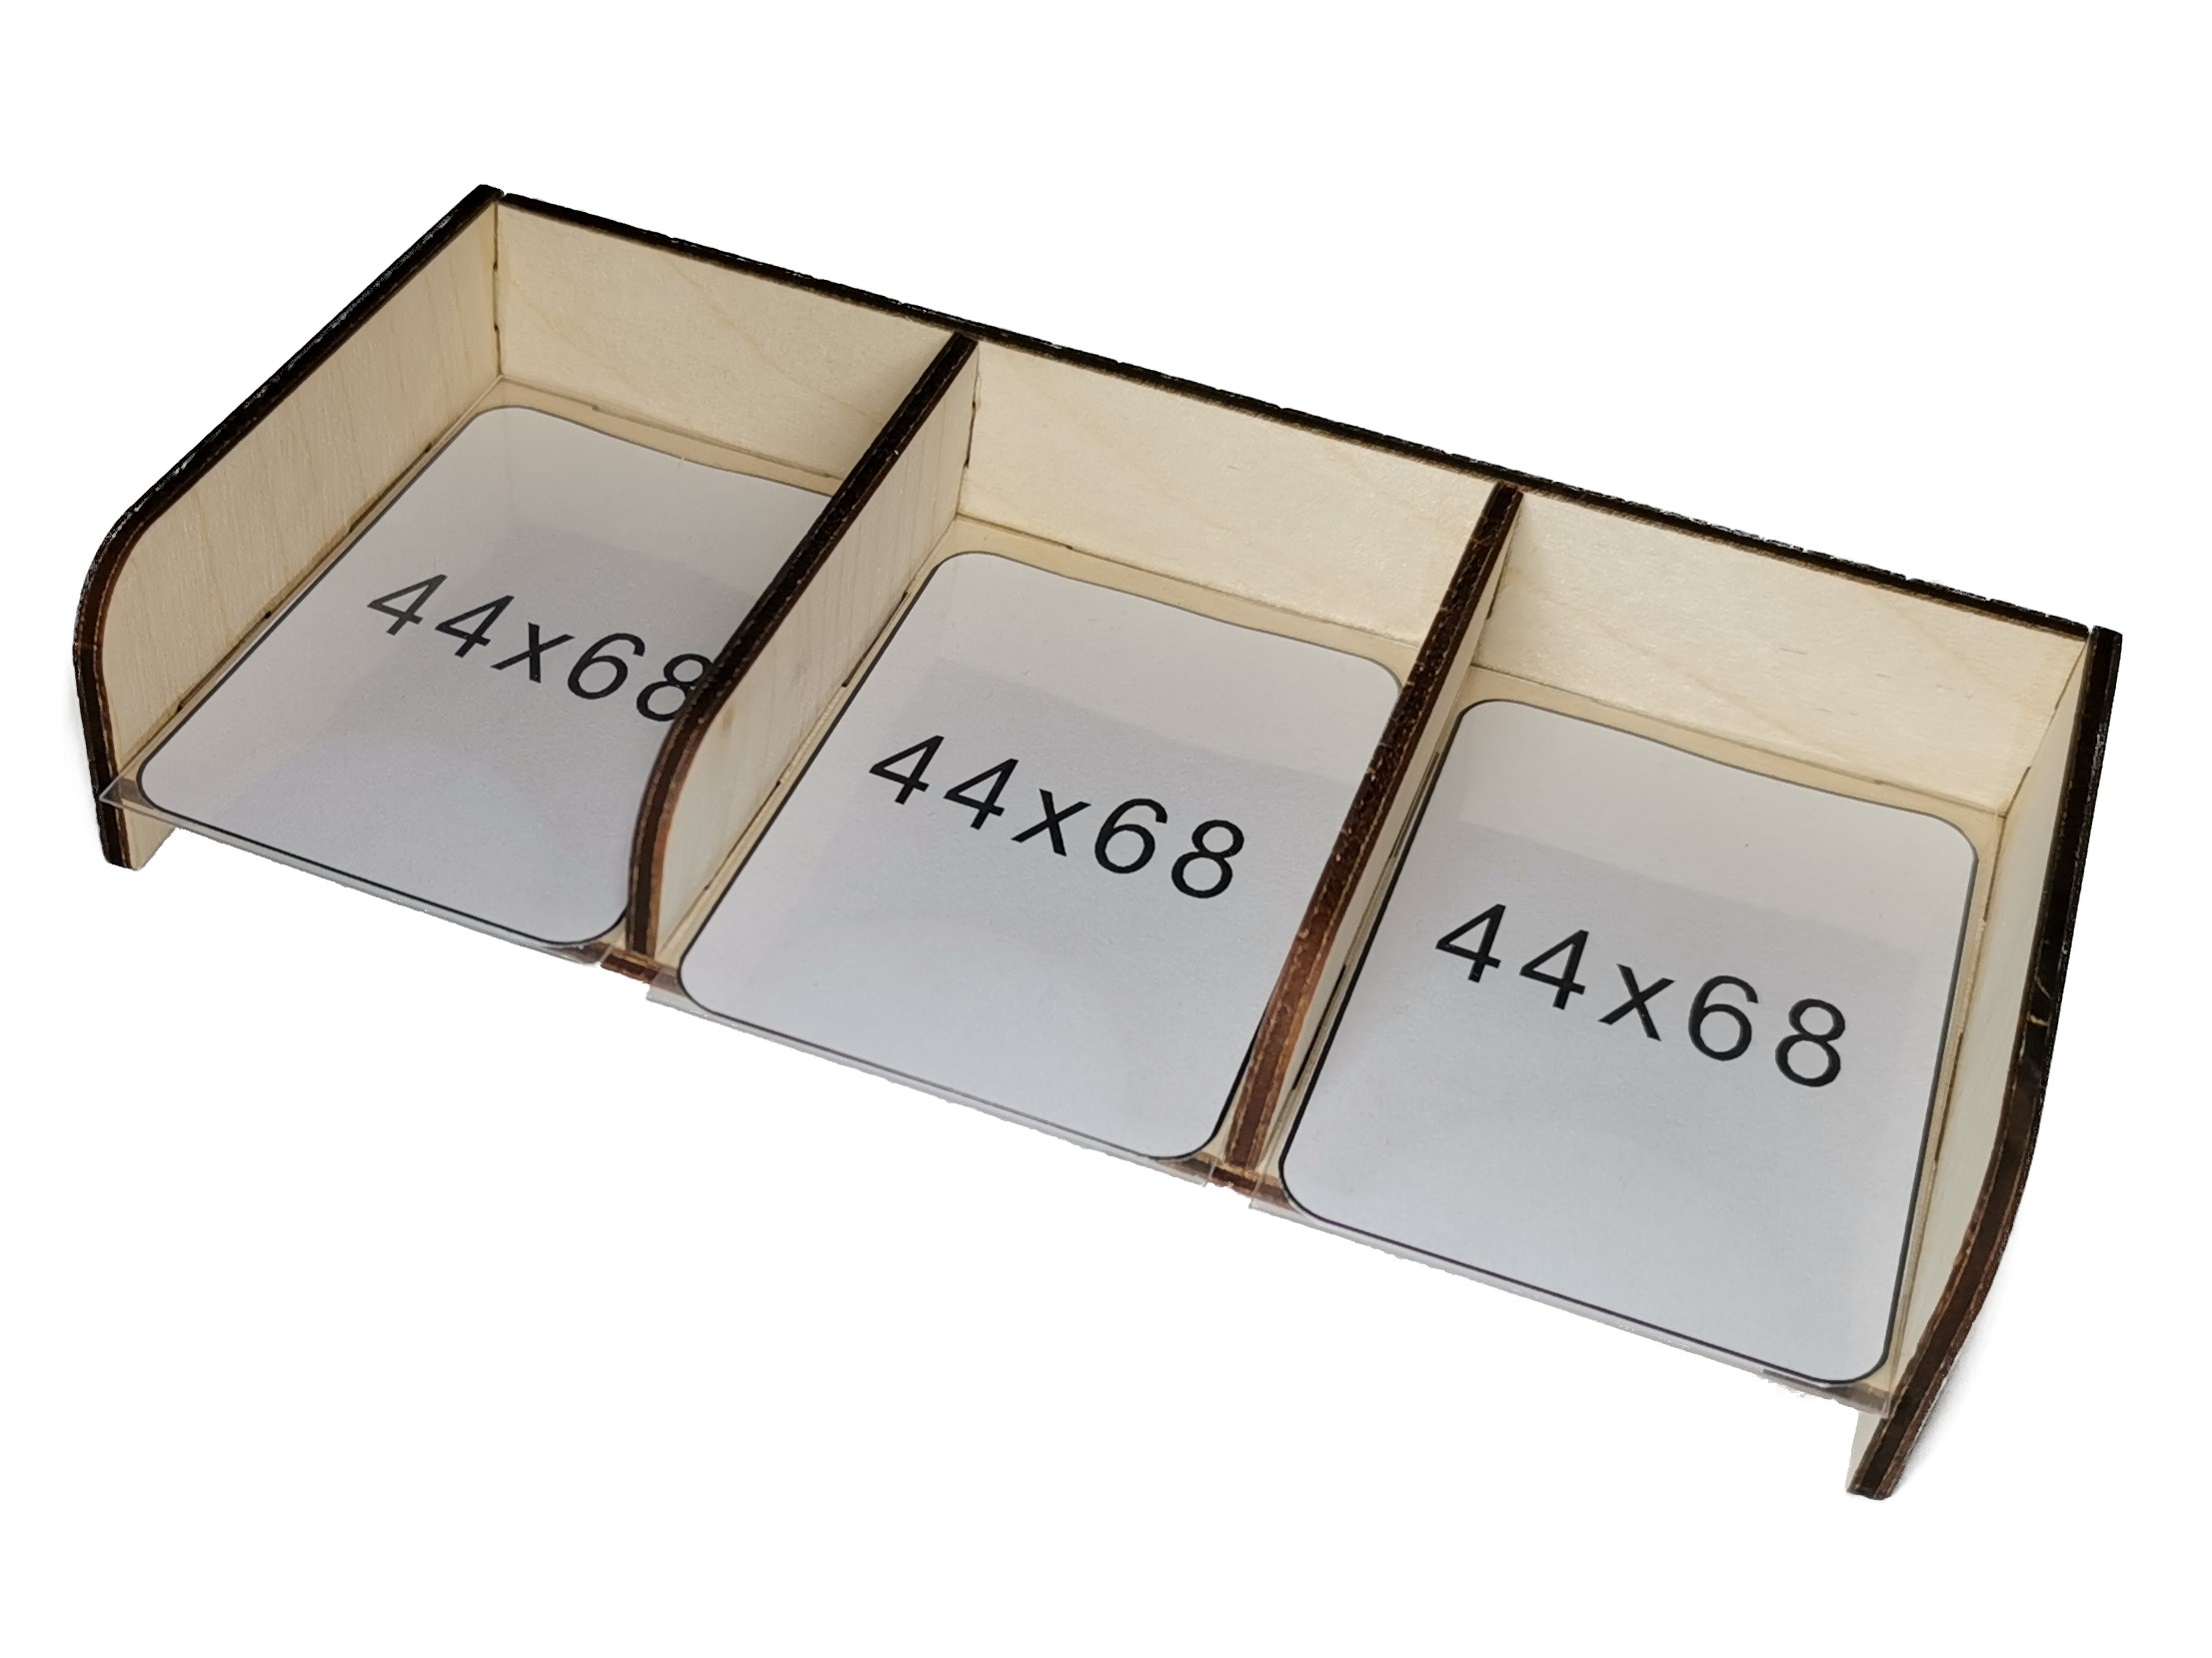 KartenhaltermitKarten2